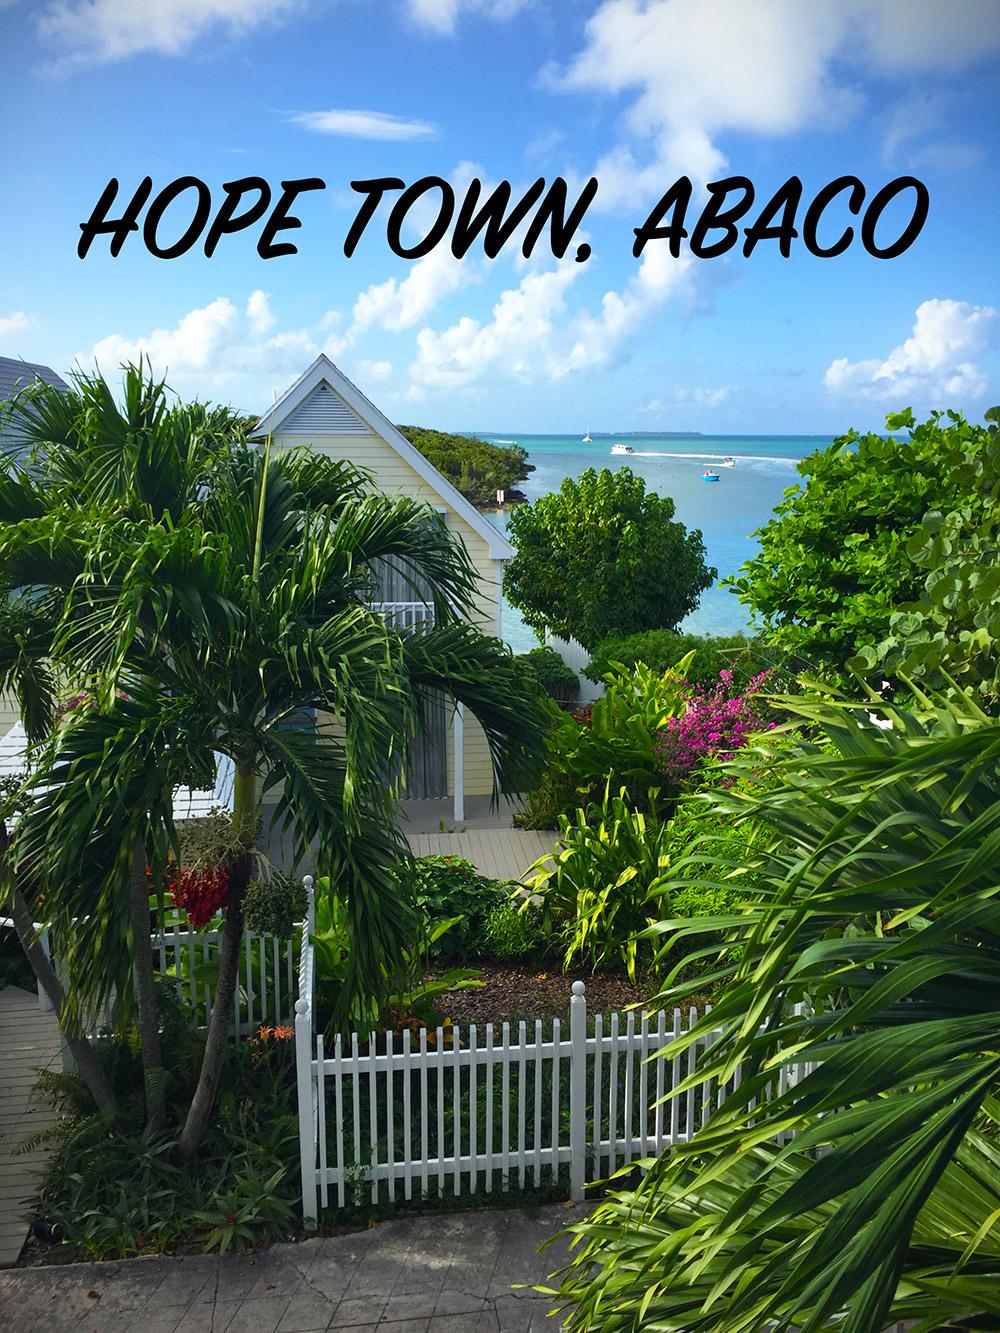 Hopetown Abaco